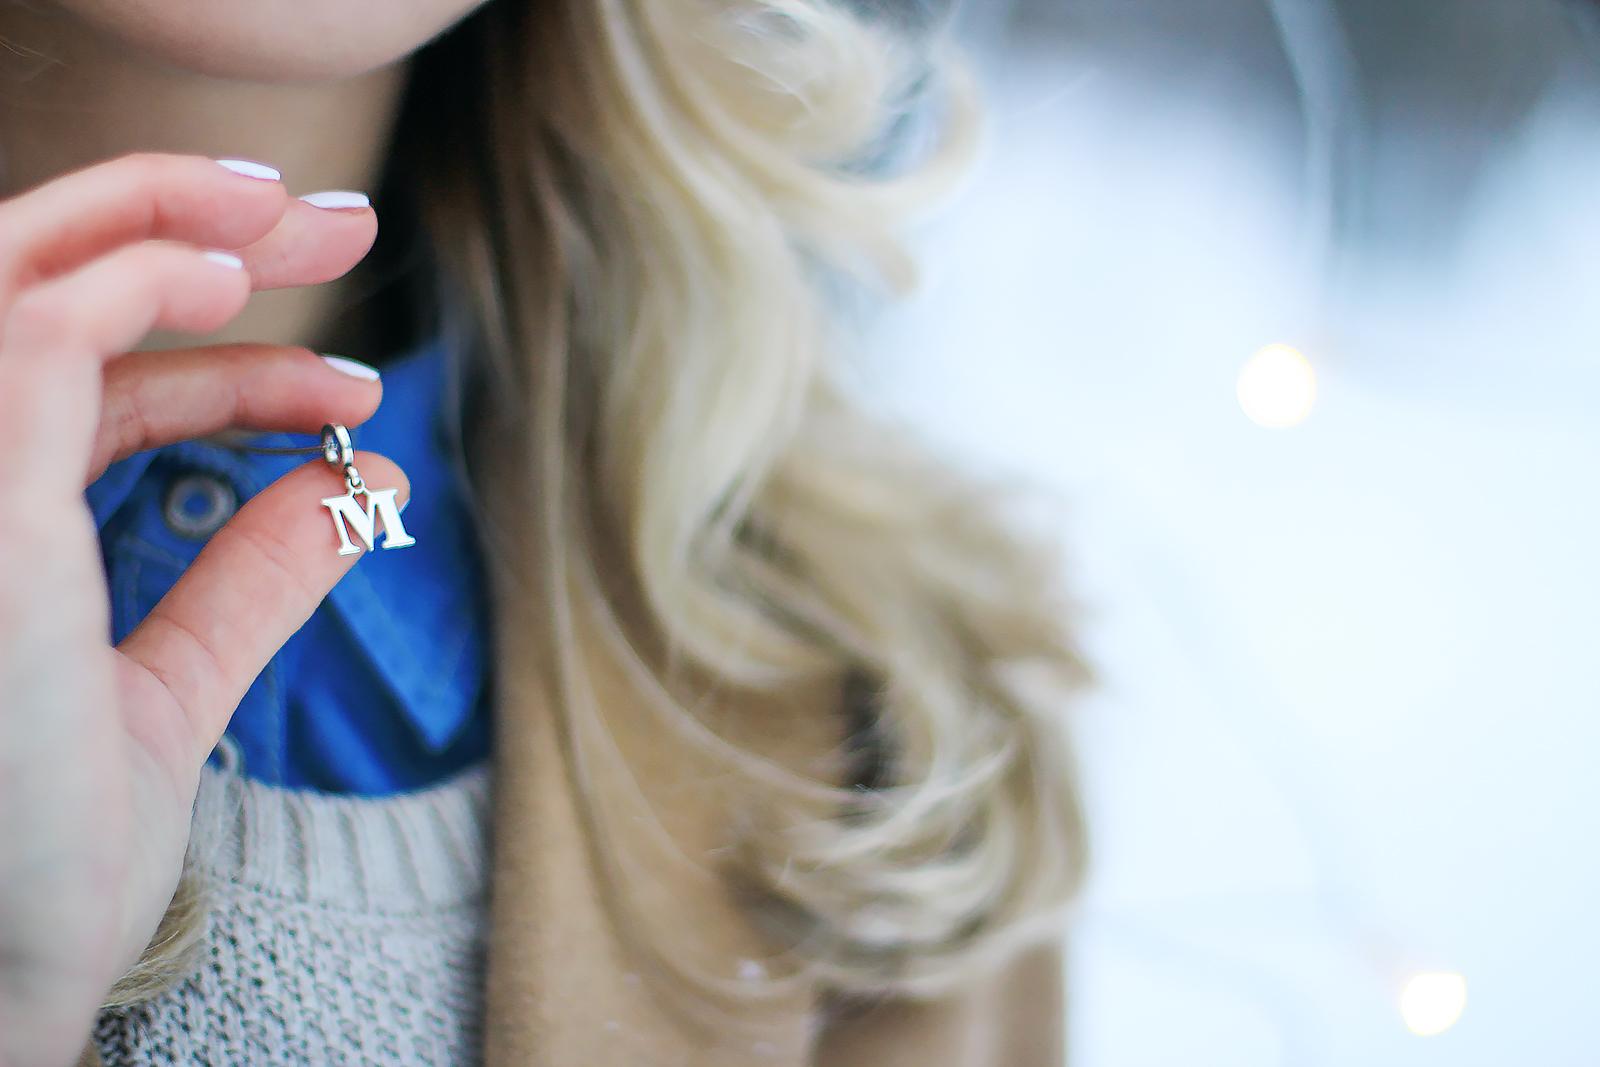 margarita_maslova_winter_look_blue_bini_hat_camel_coat